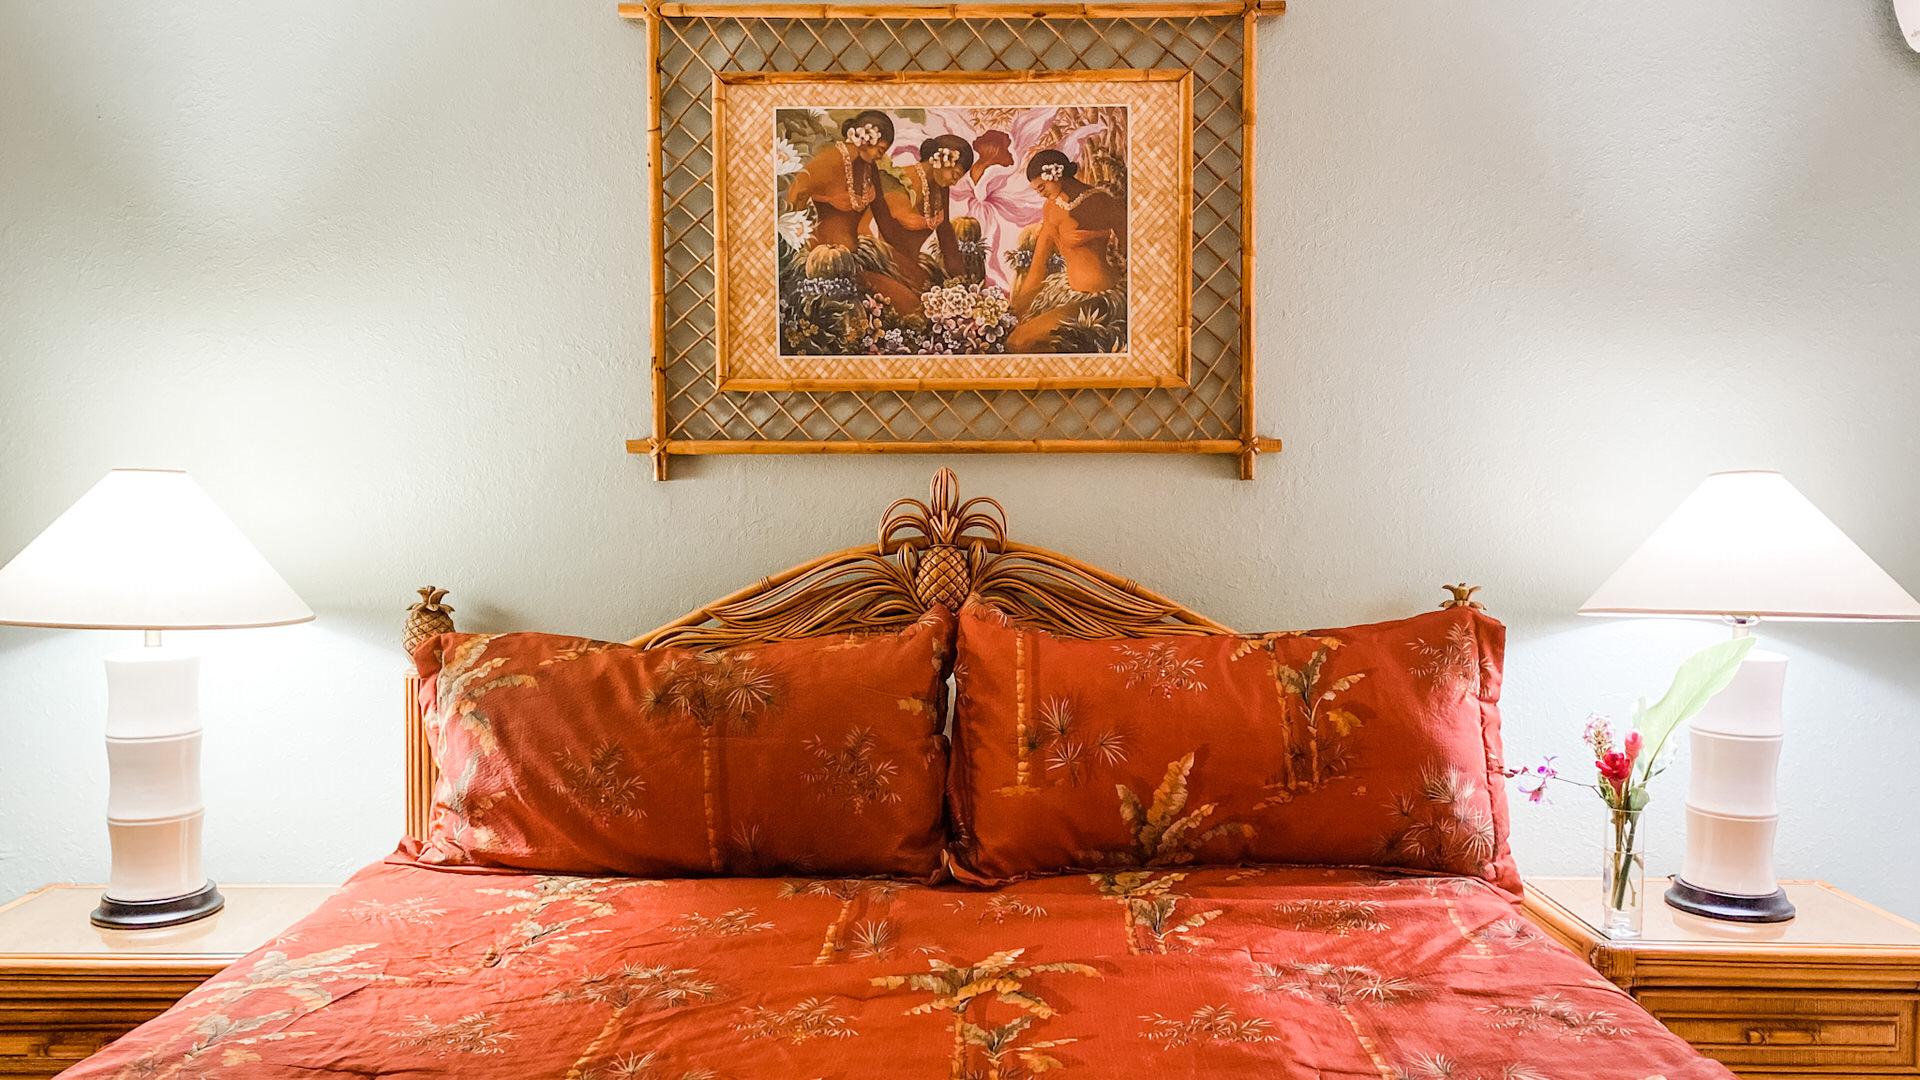 B202 Master Bedroom King Size Bed